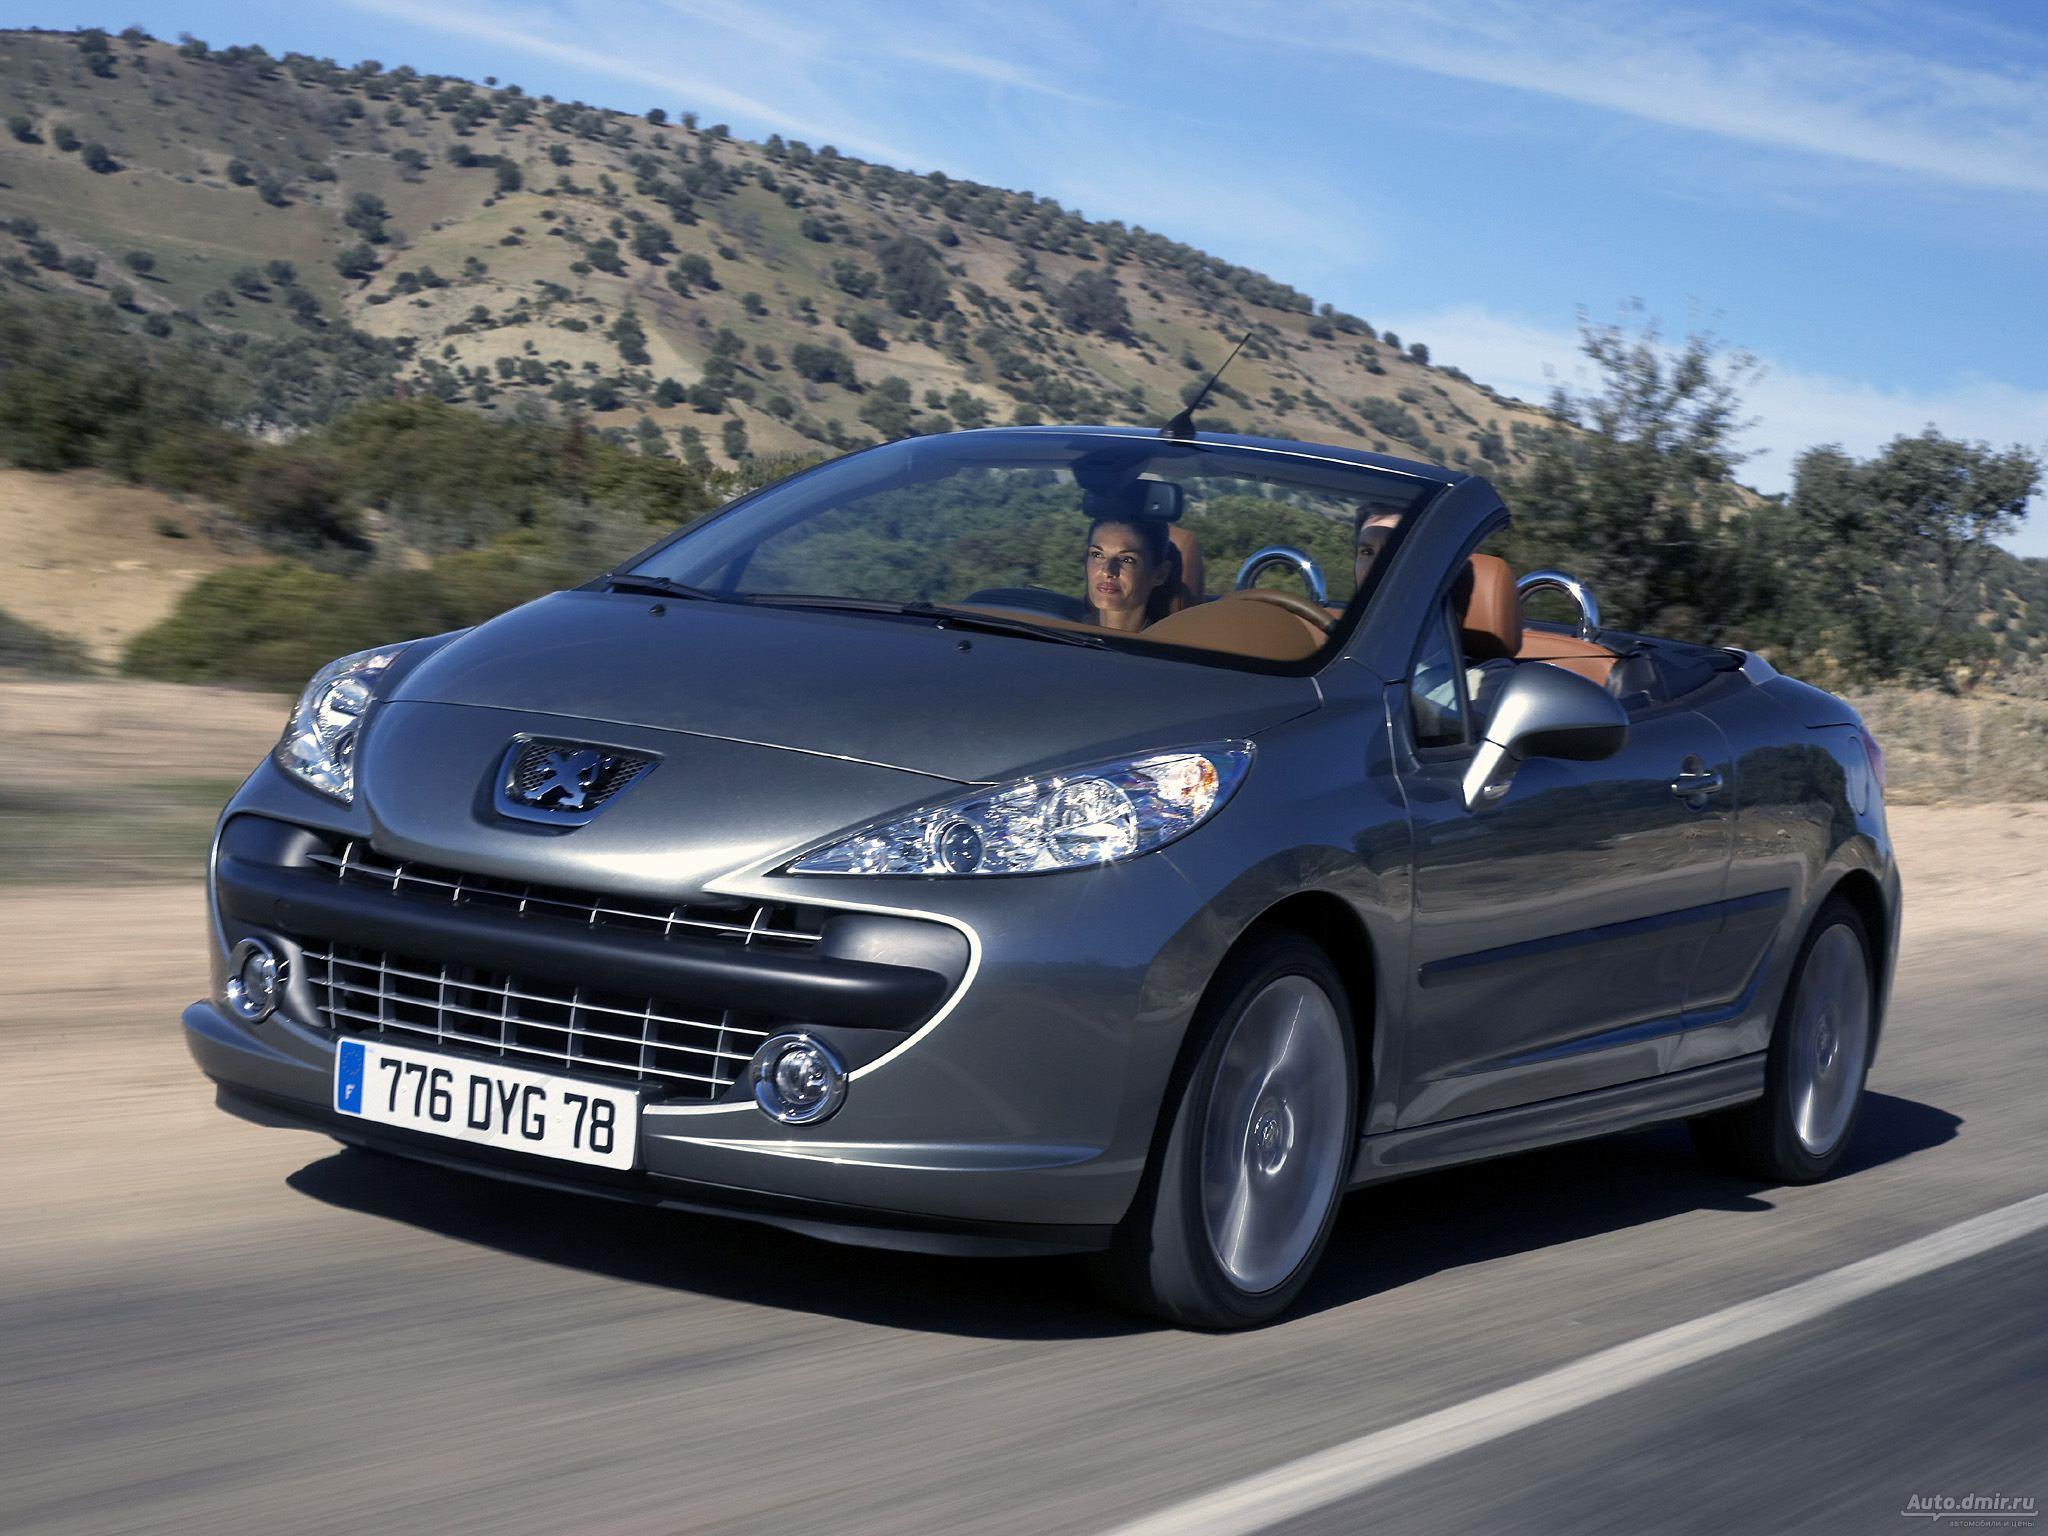 Peugeot 207 Desktop Backgrounds